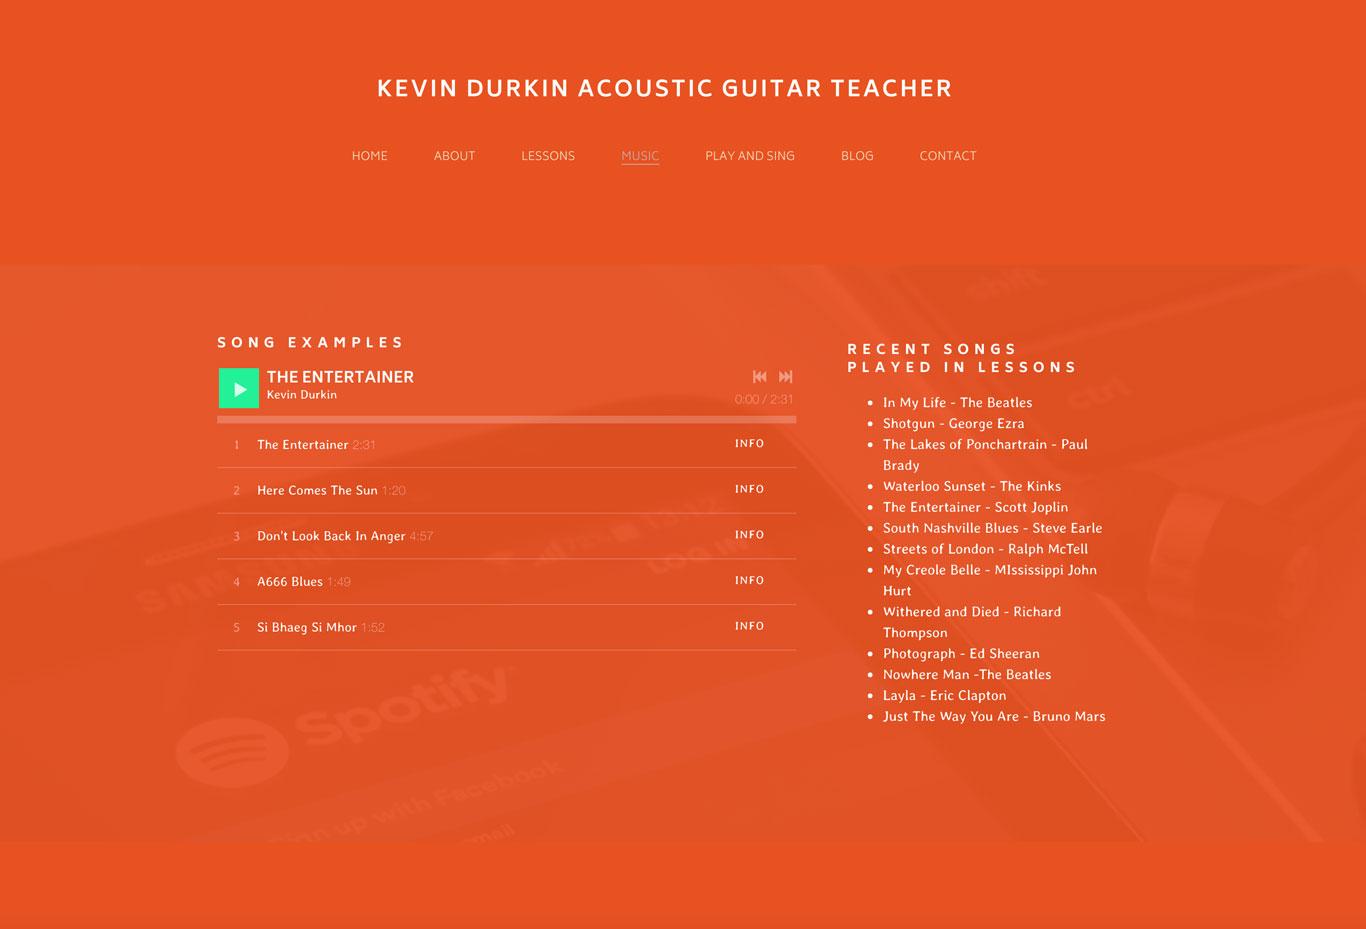 Guitar teacher website example